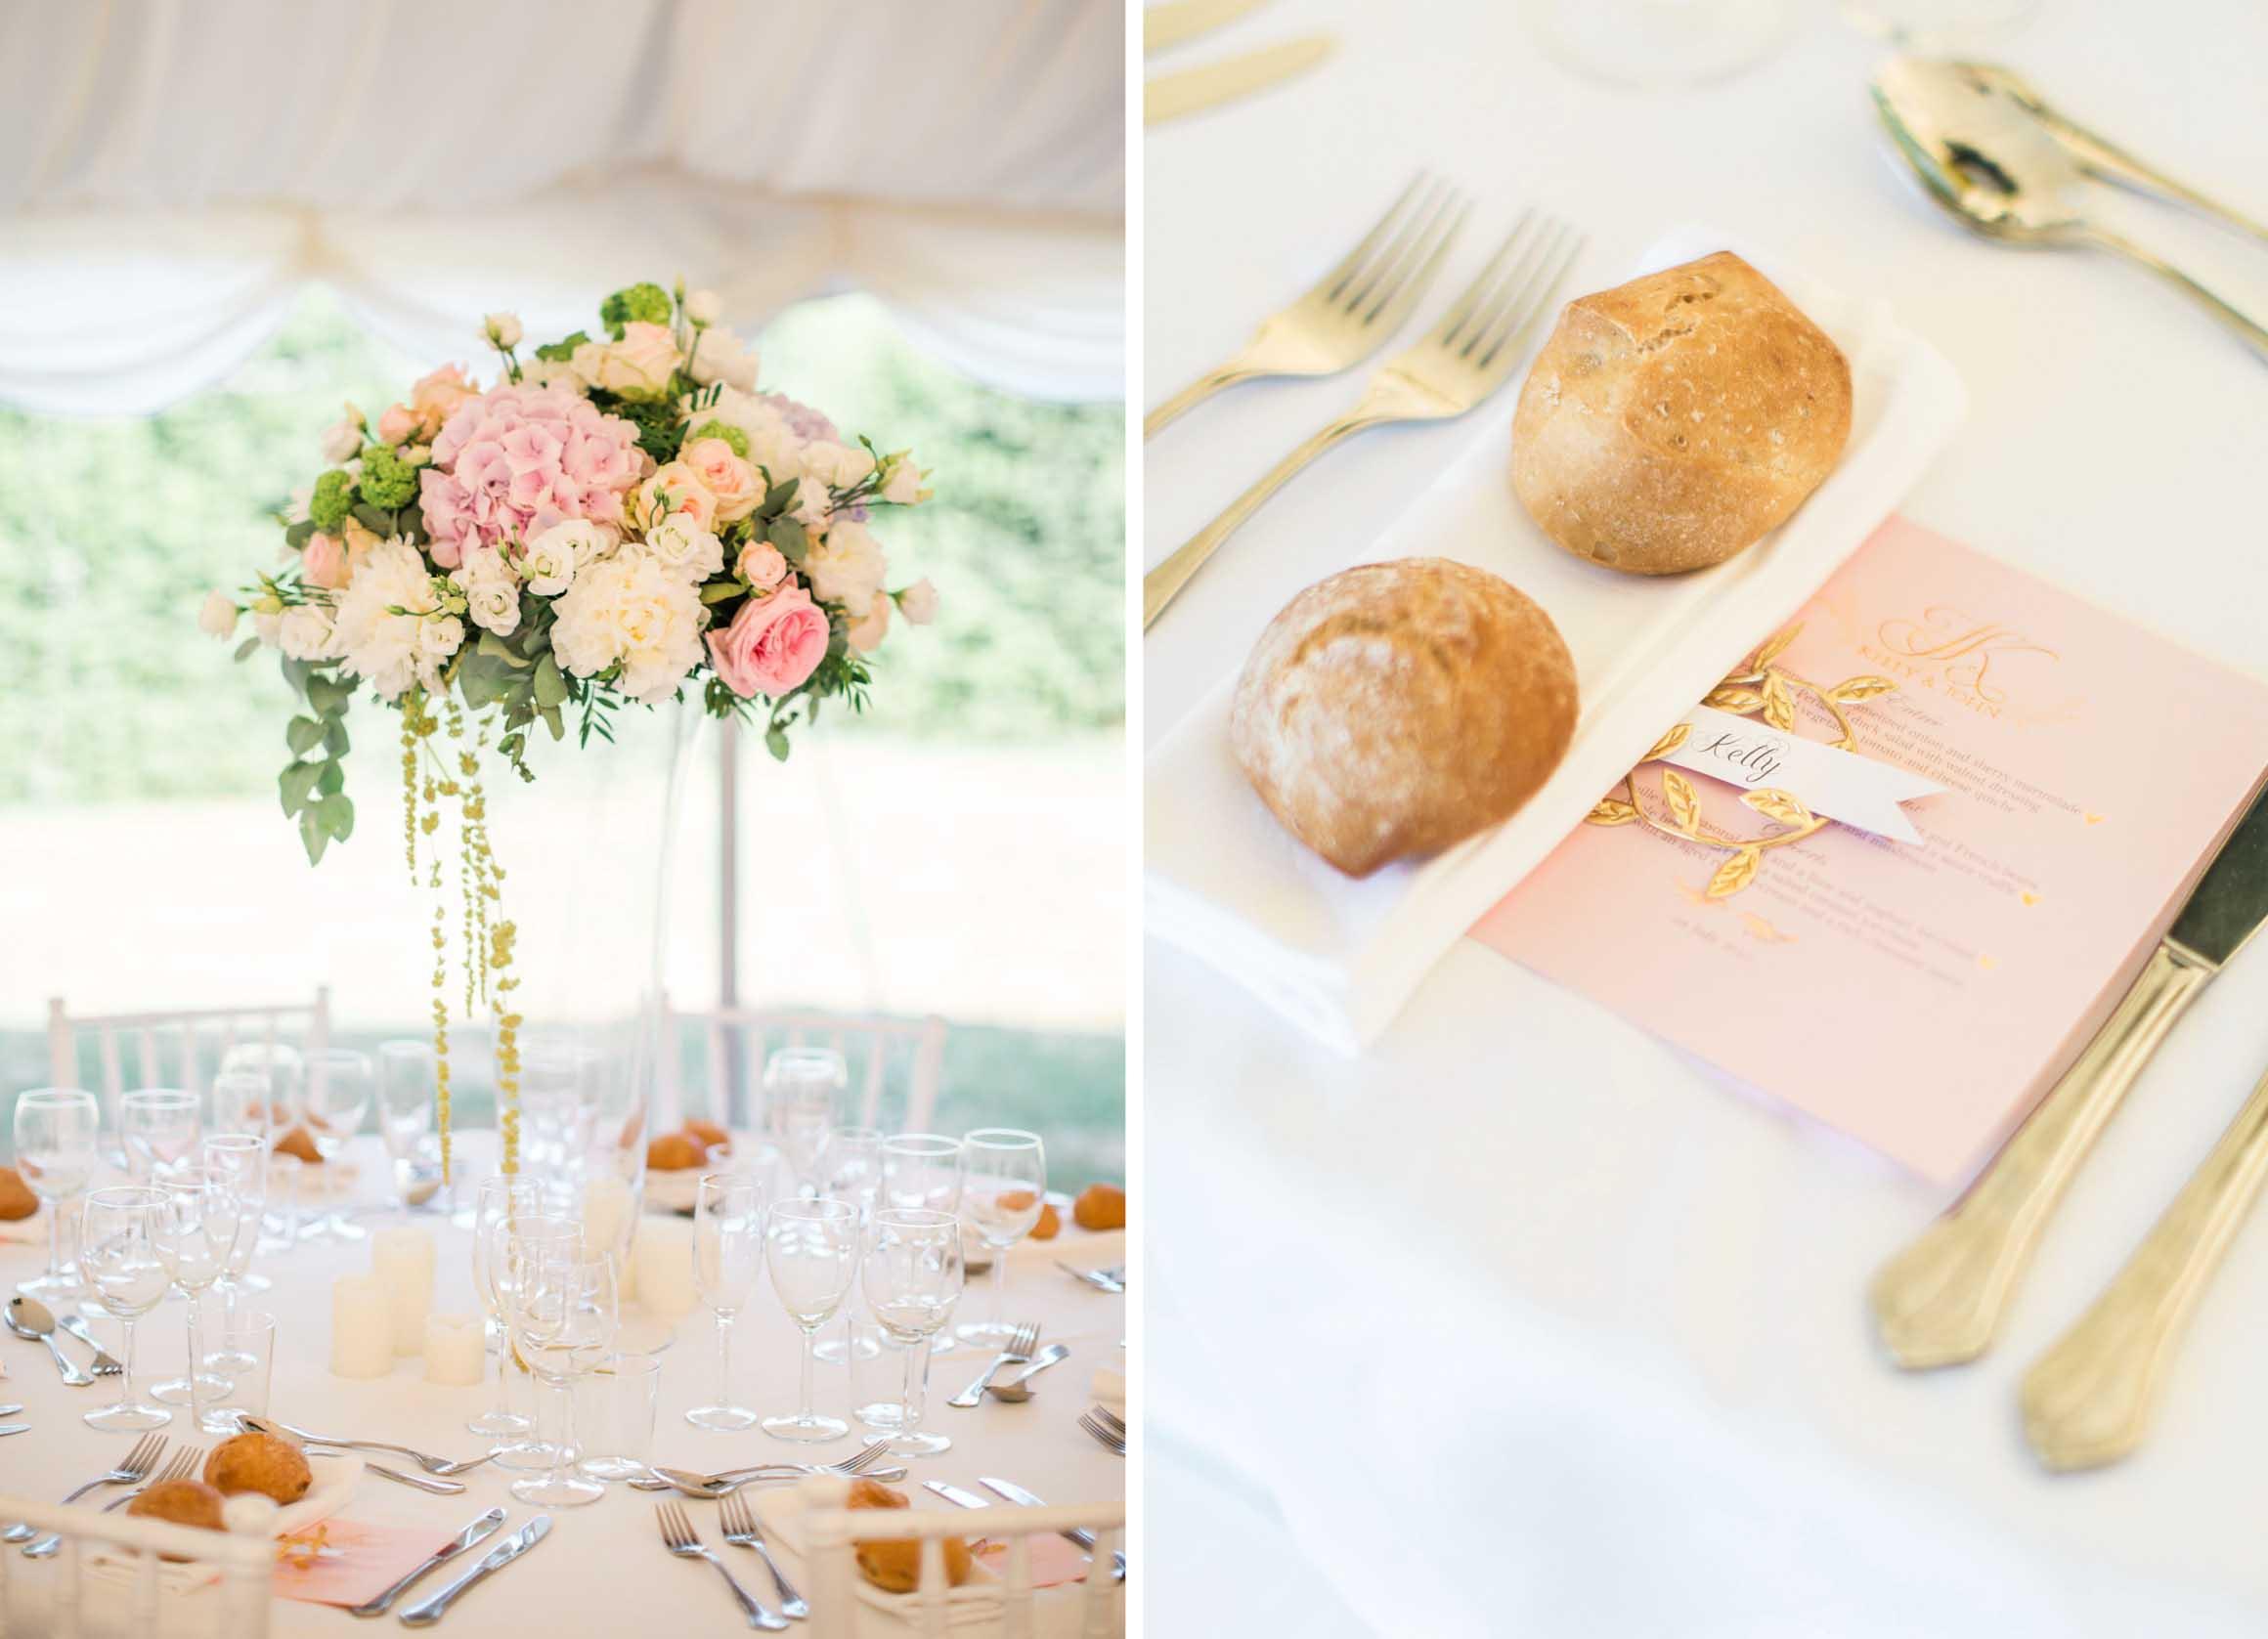 Amy O'Boyle Photography- Destination & UK Fine Art Film Wedding Photographer- Chateau La Durantie Wedding 5.jpg